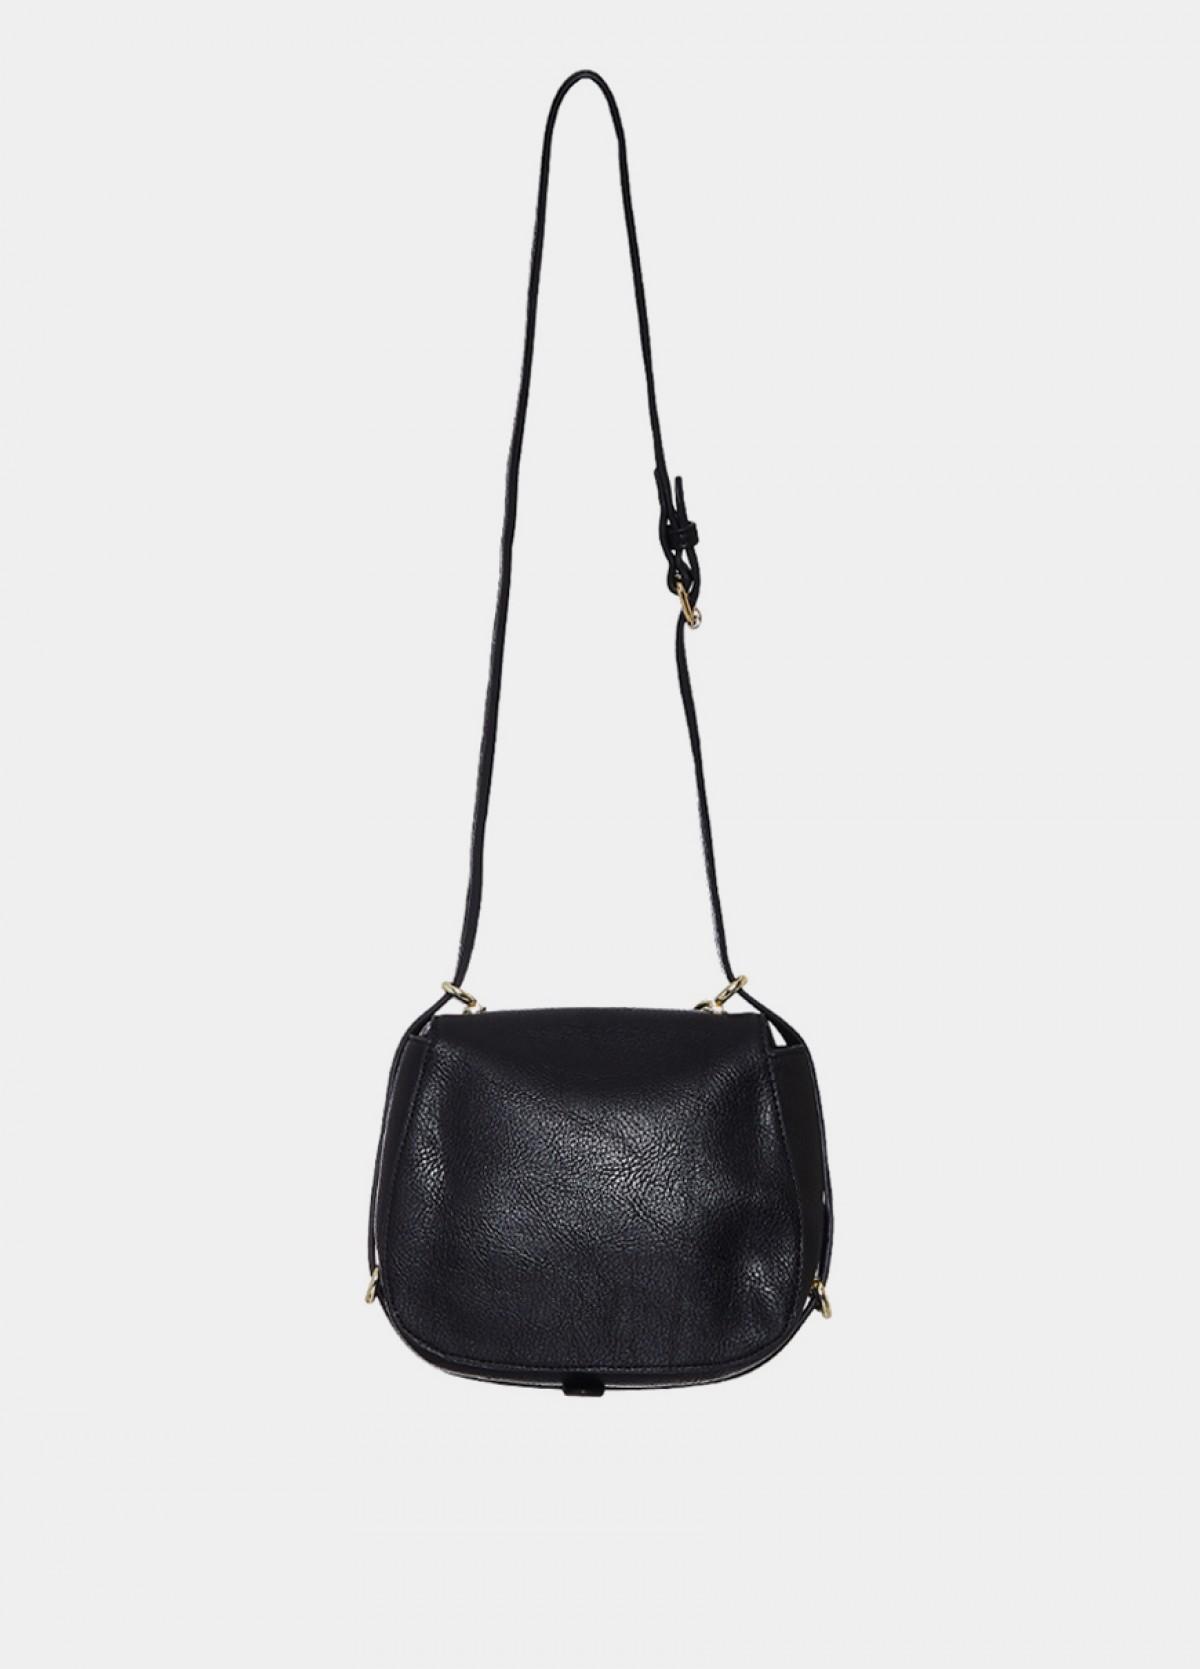 The Black Sling Handbag